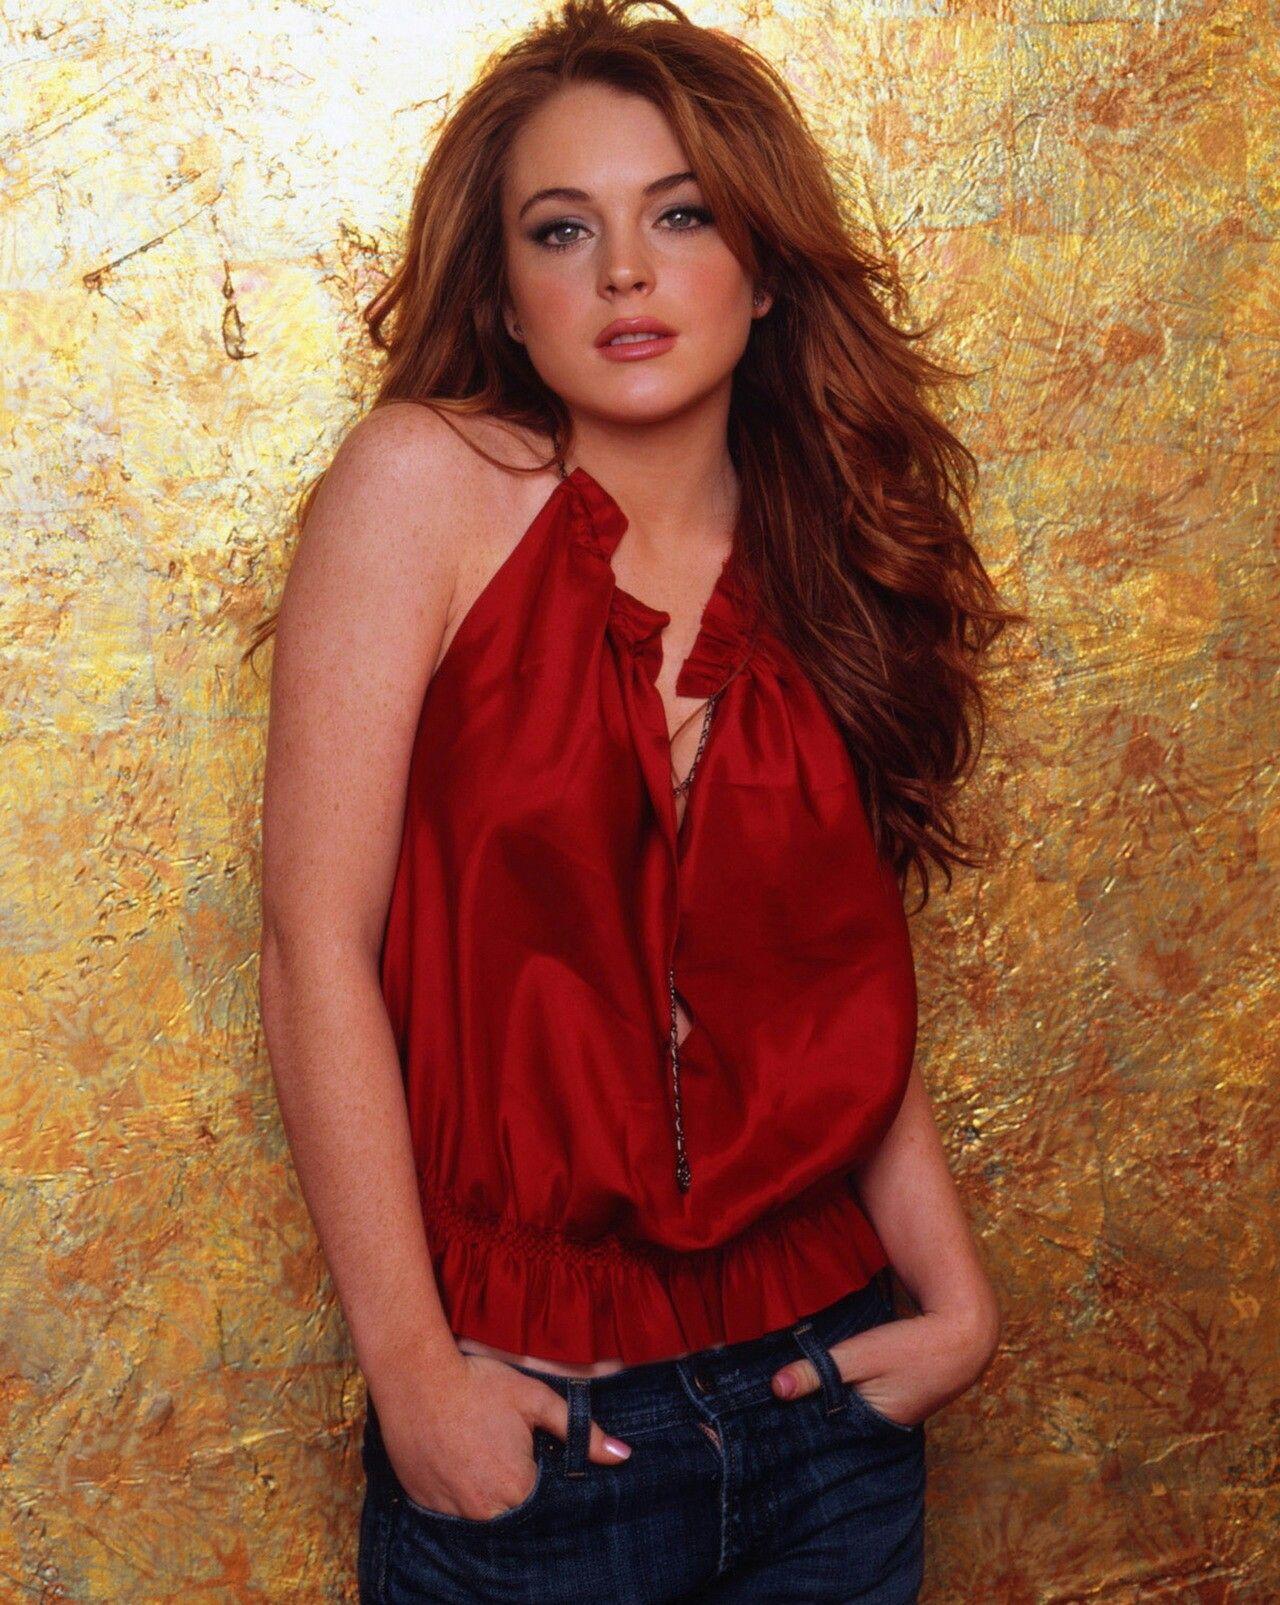 Young Lindsay Lohan nude photos 2019